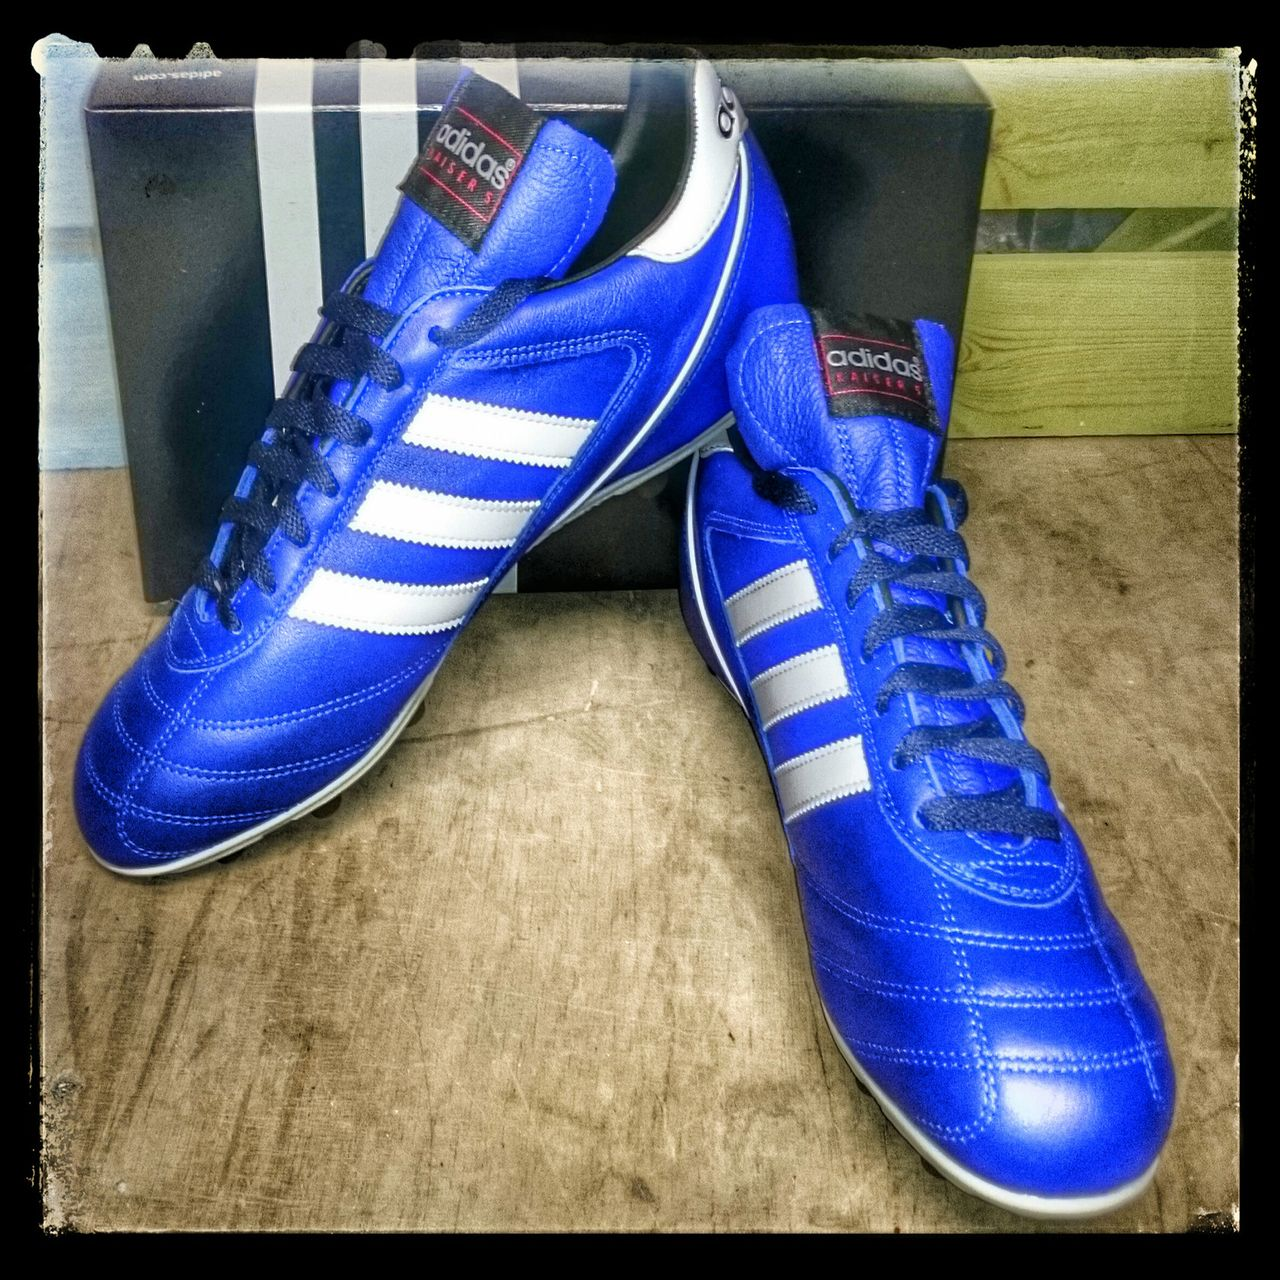 Adidas kaiser 5 liga fg royal bluewhite football